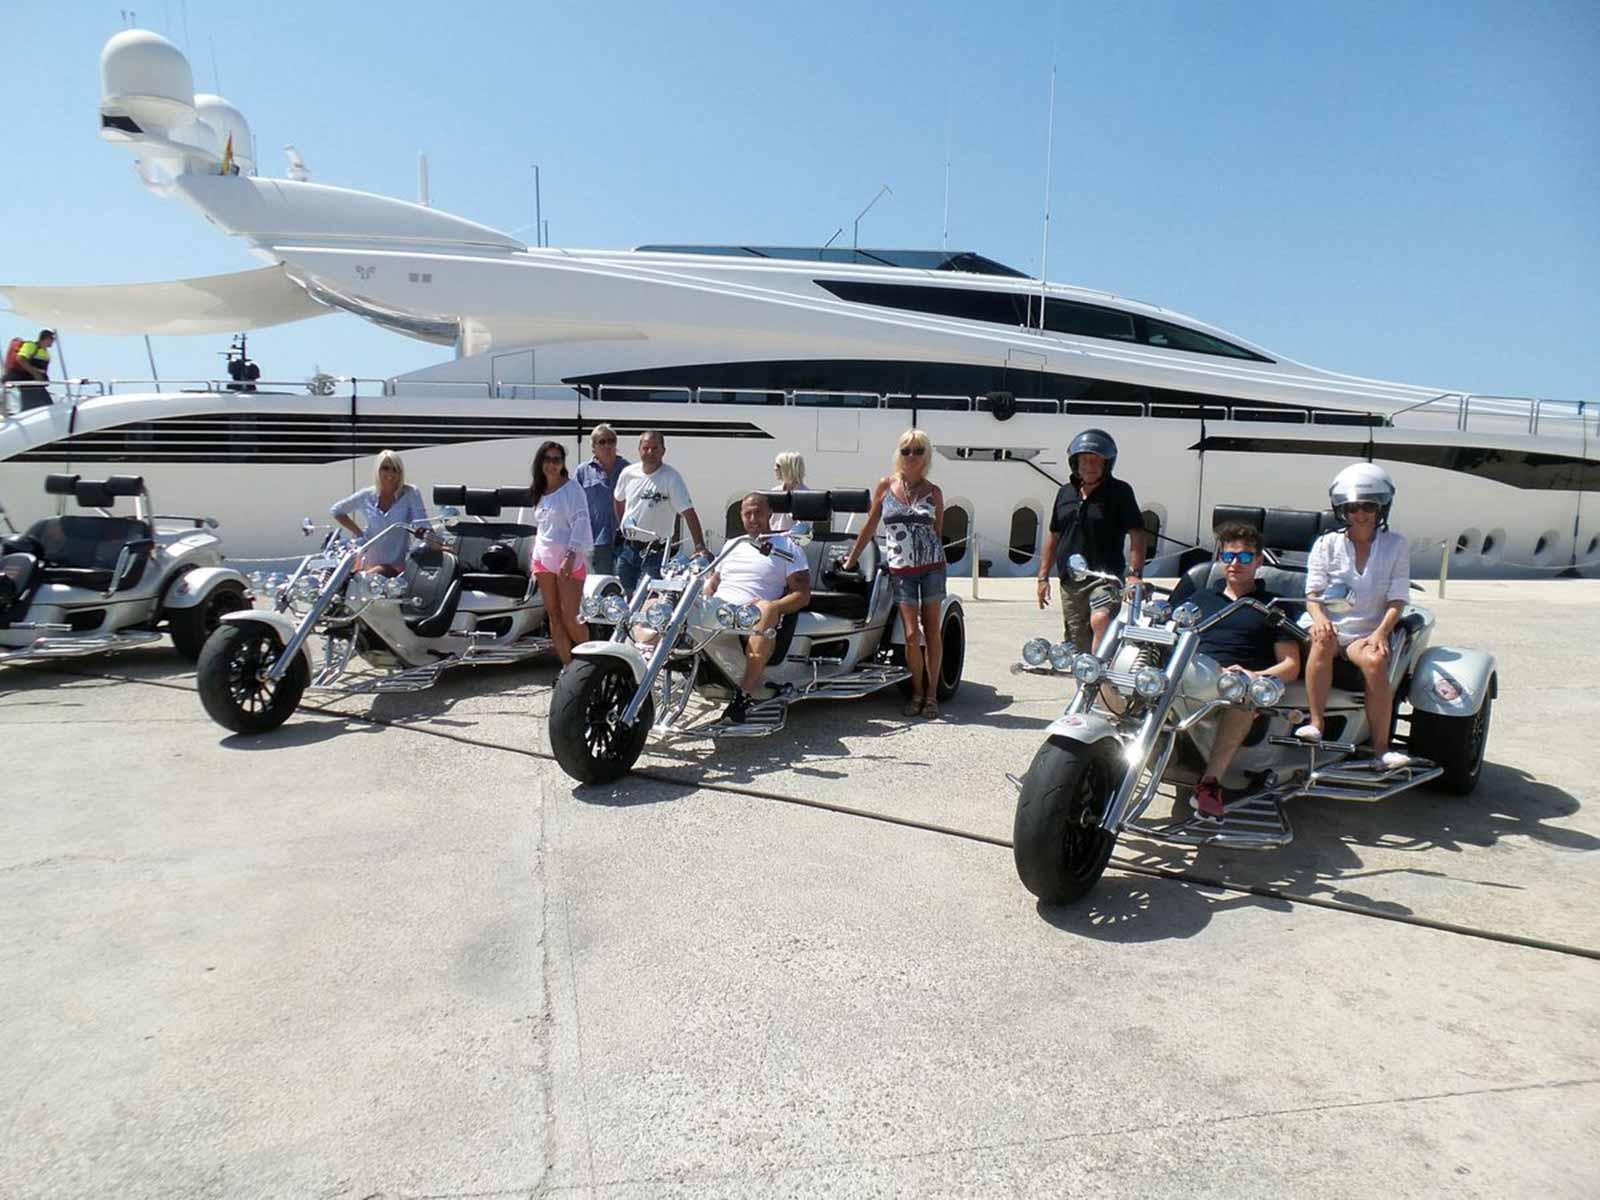 Trike-Mallorca-Trike-Tour-Mallorca-6